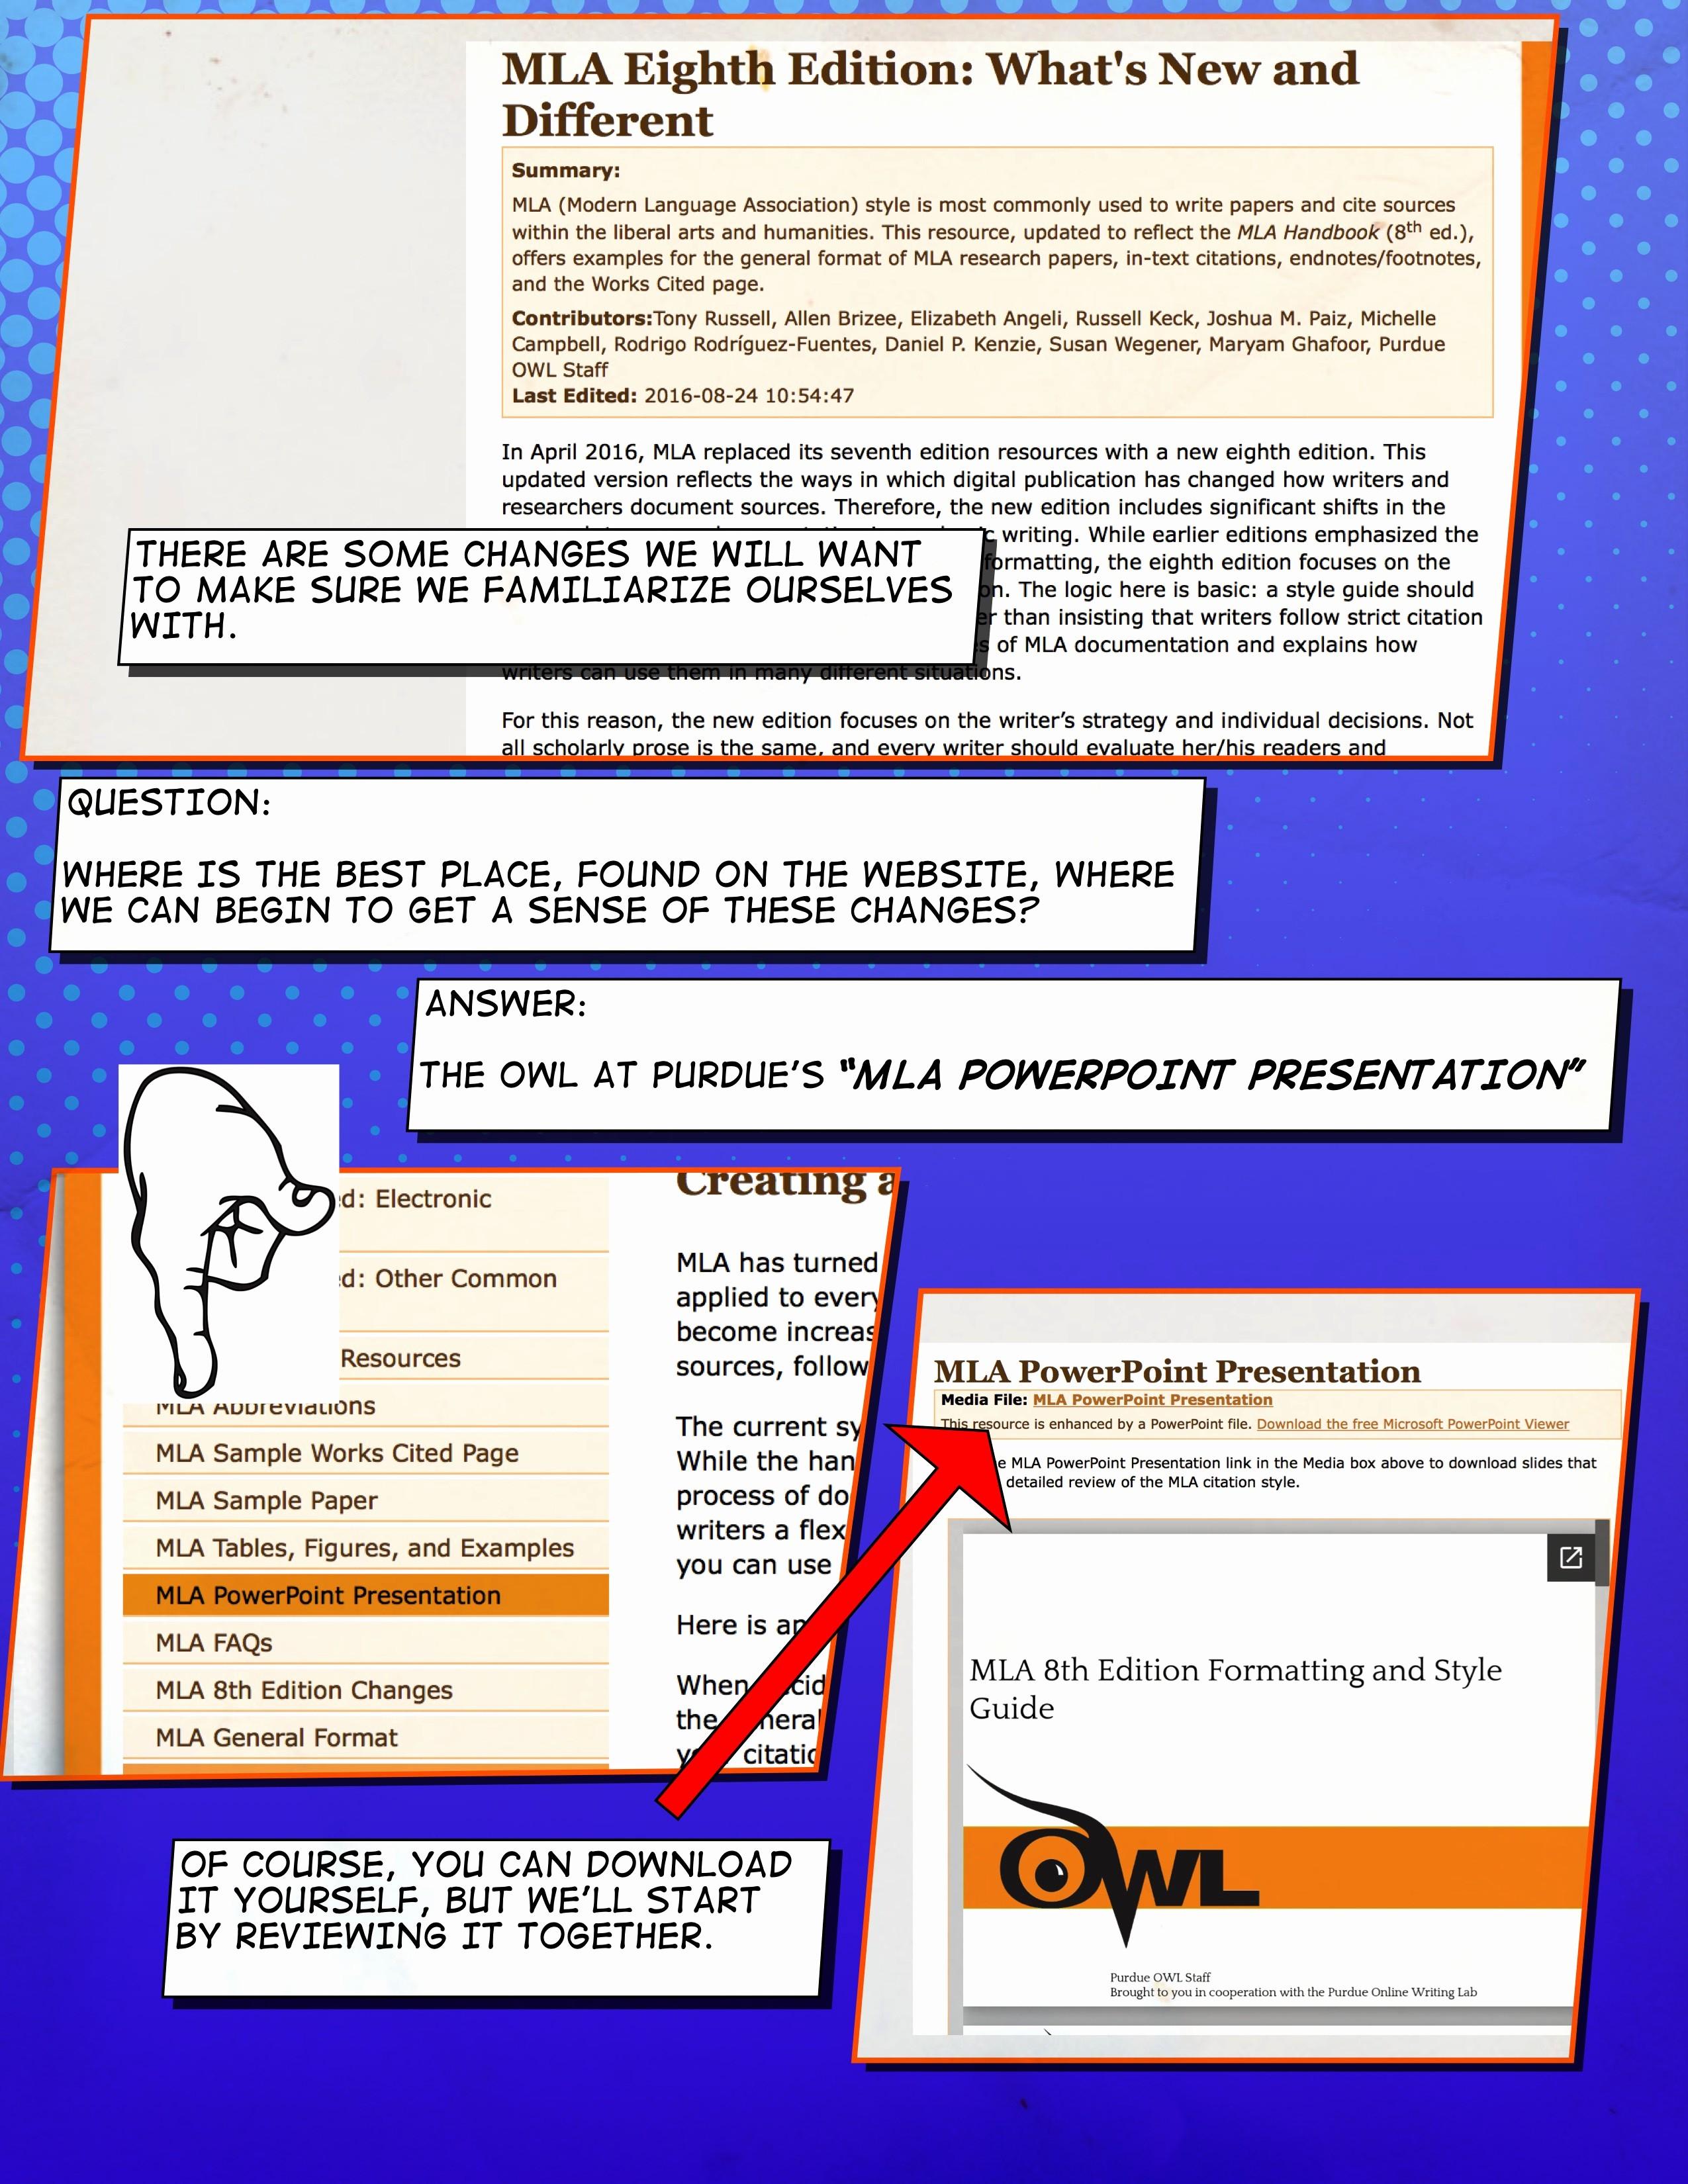 Mla format On Word 2016 Elegant Getting Into Mla formatting Basics – Position 1